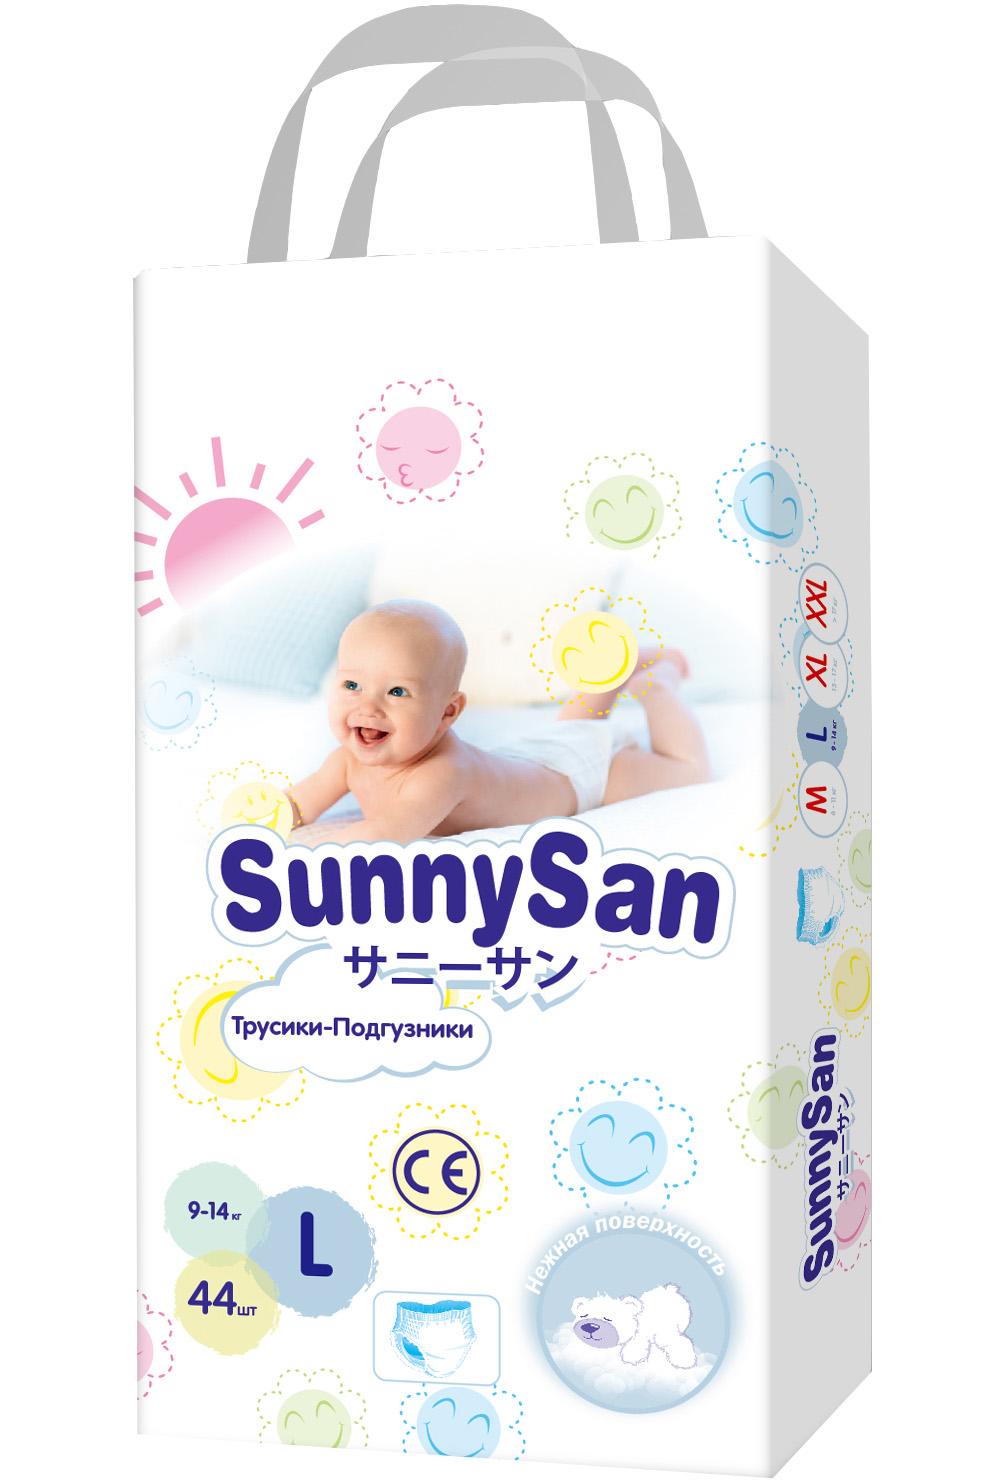 Трусики-подгузники SunnySan L (9-14 кг) 44 шт. трусики подгузники merries l 9 14 кг 44 шт